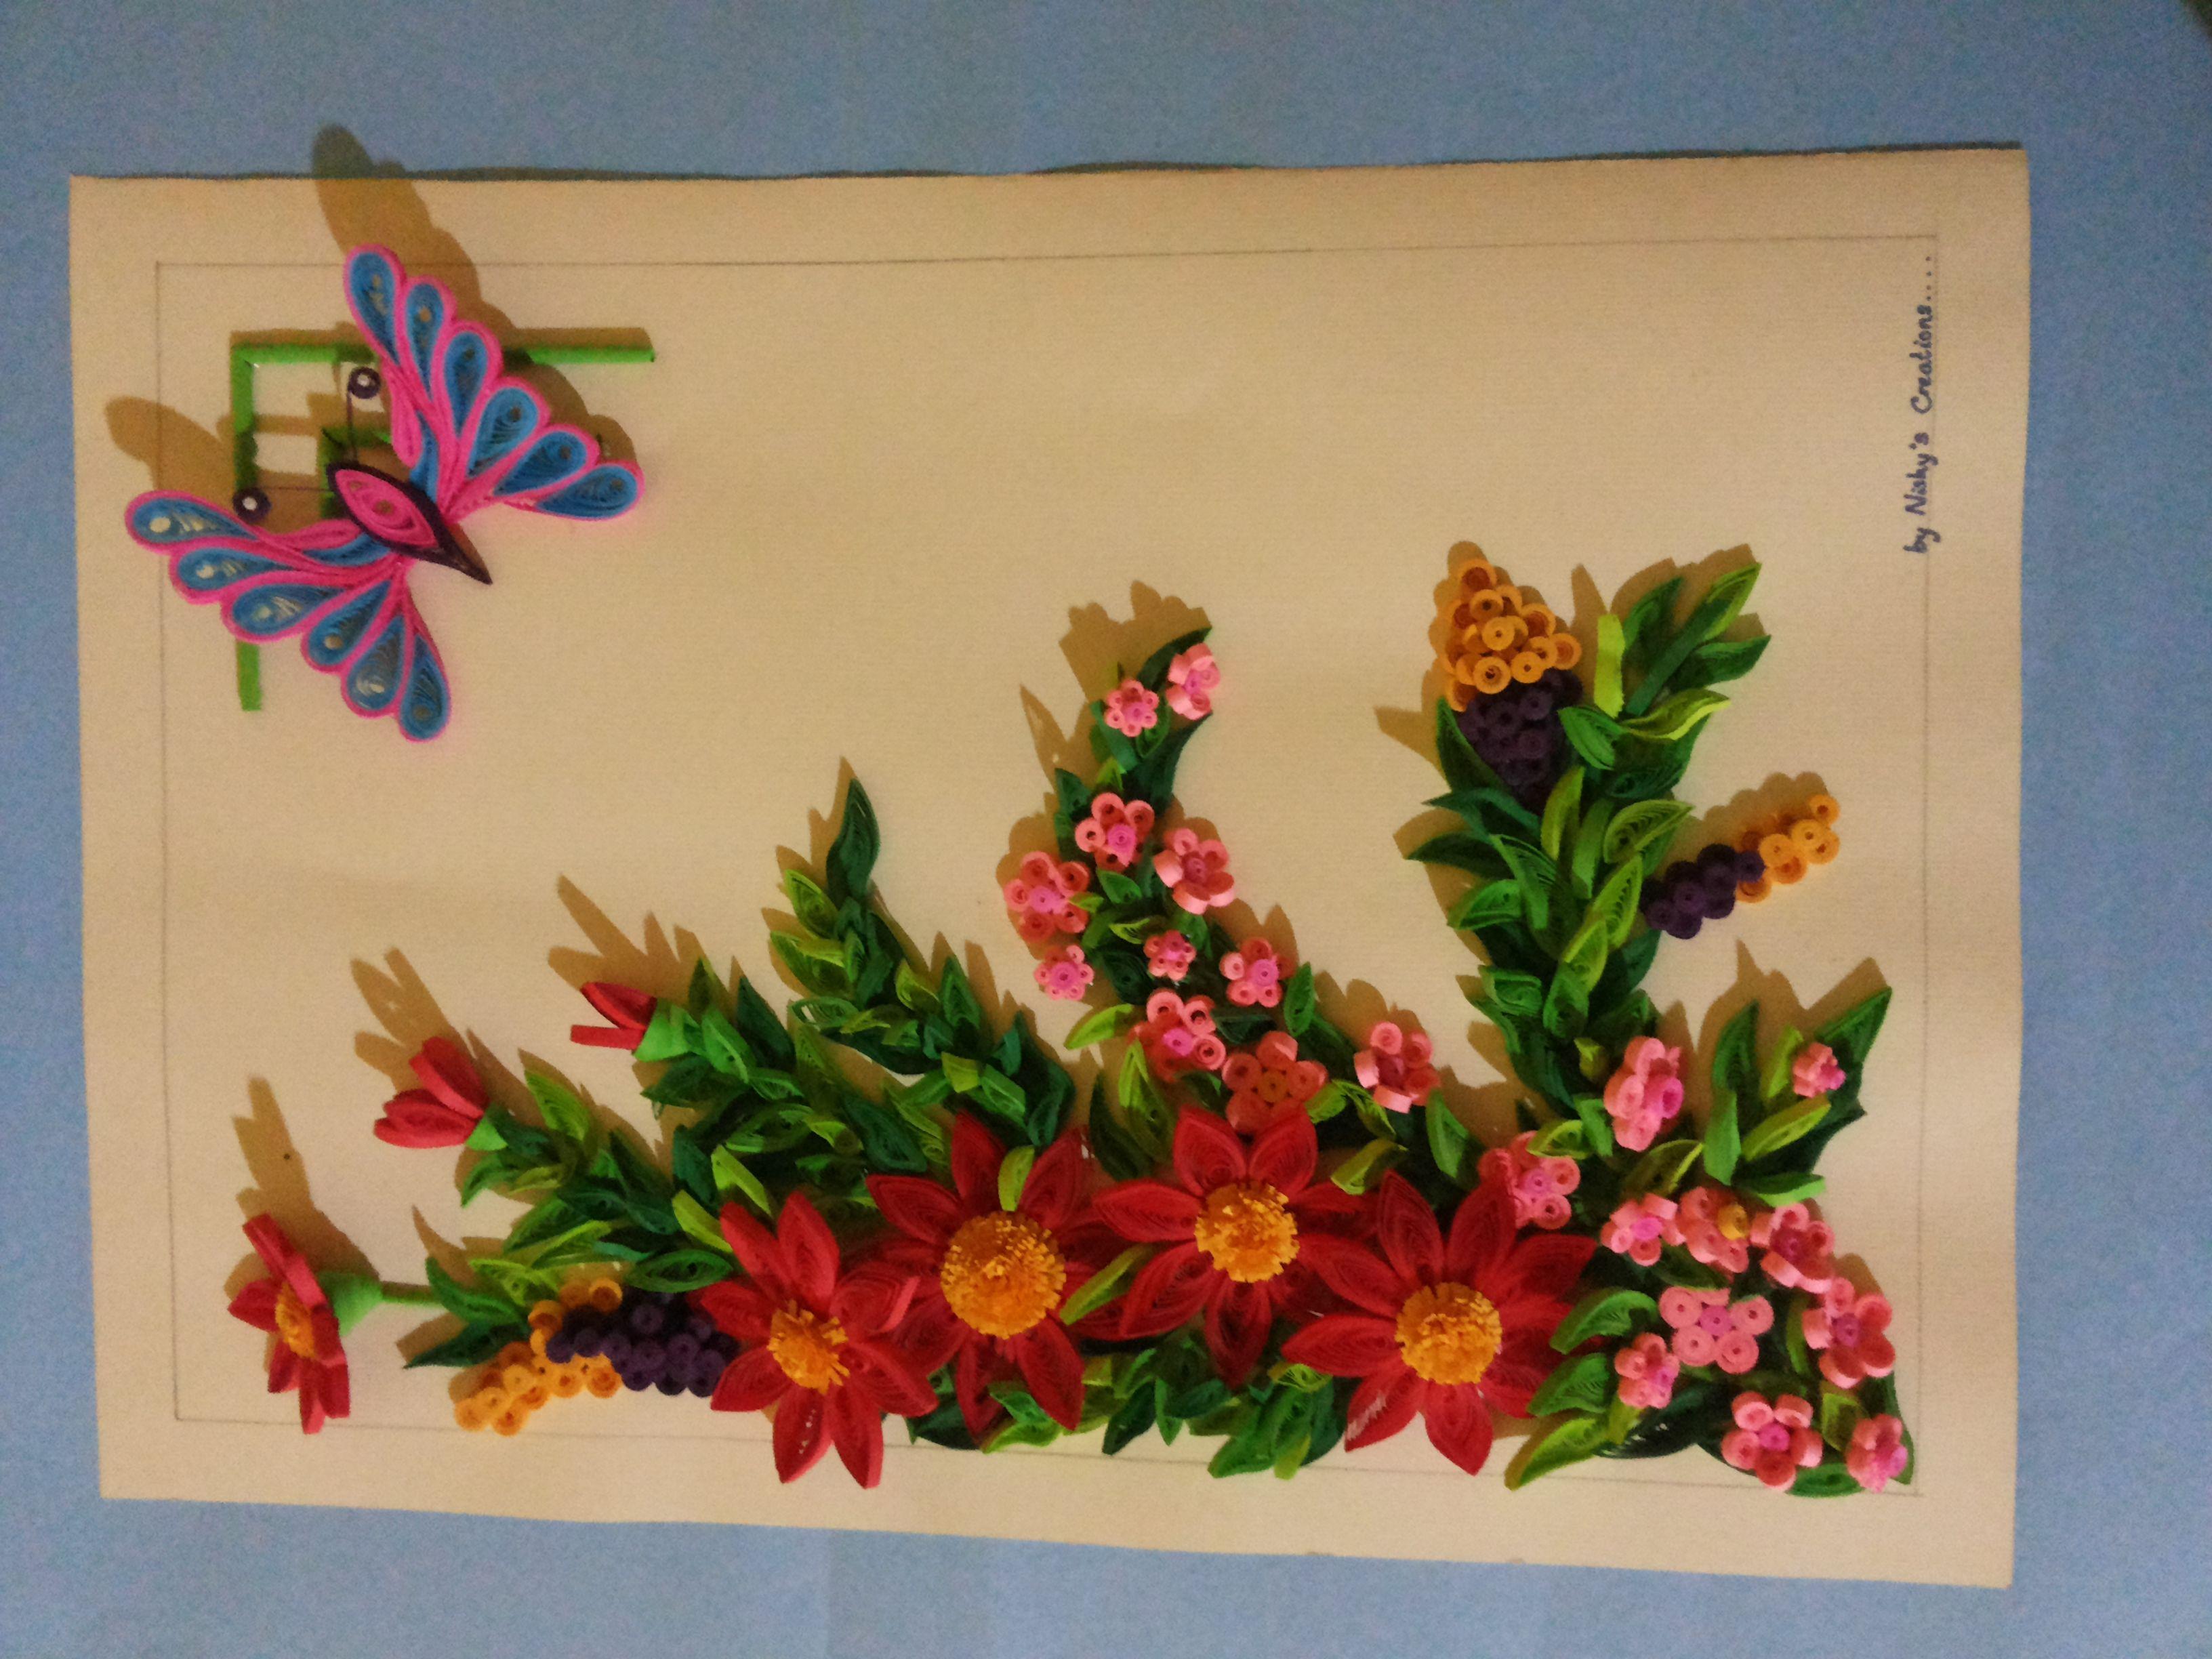 paper quilling wall art | paper quilling | Pinterest | Paper ...